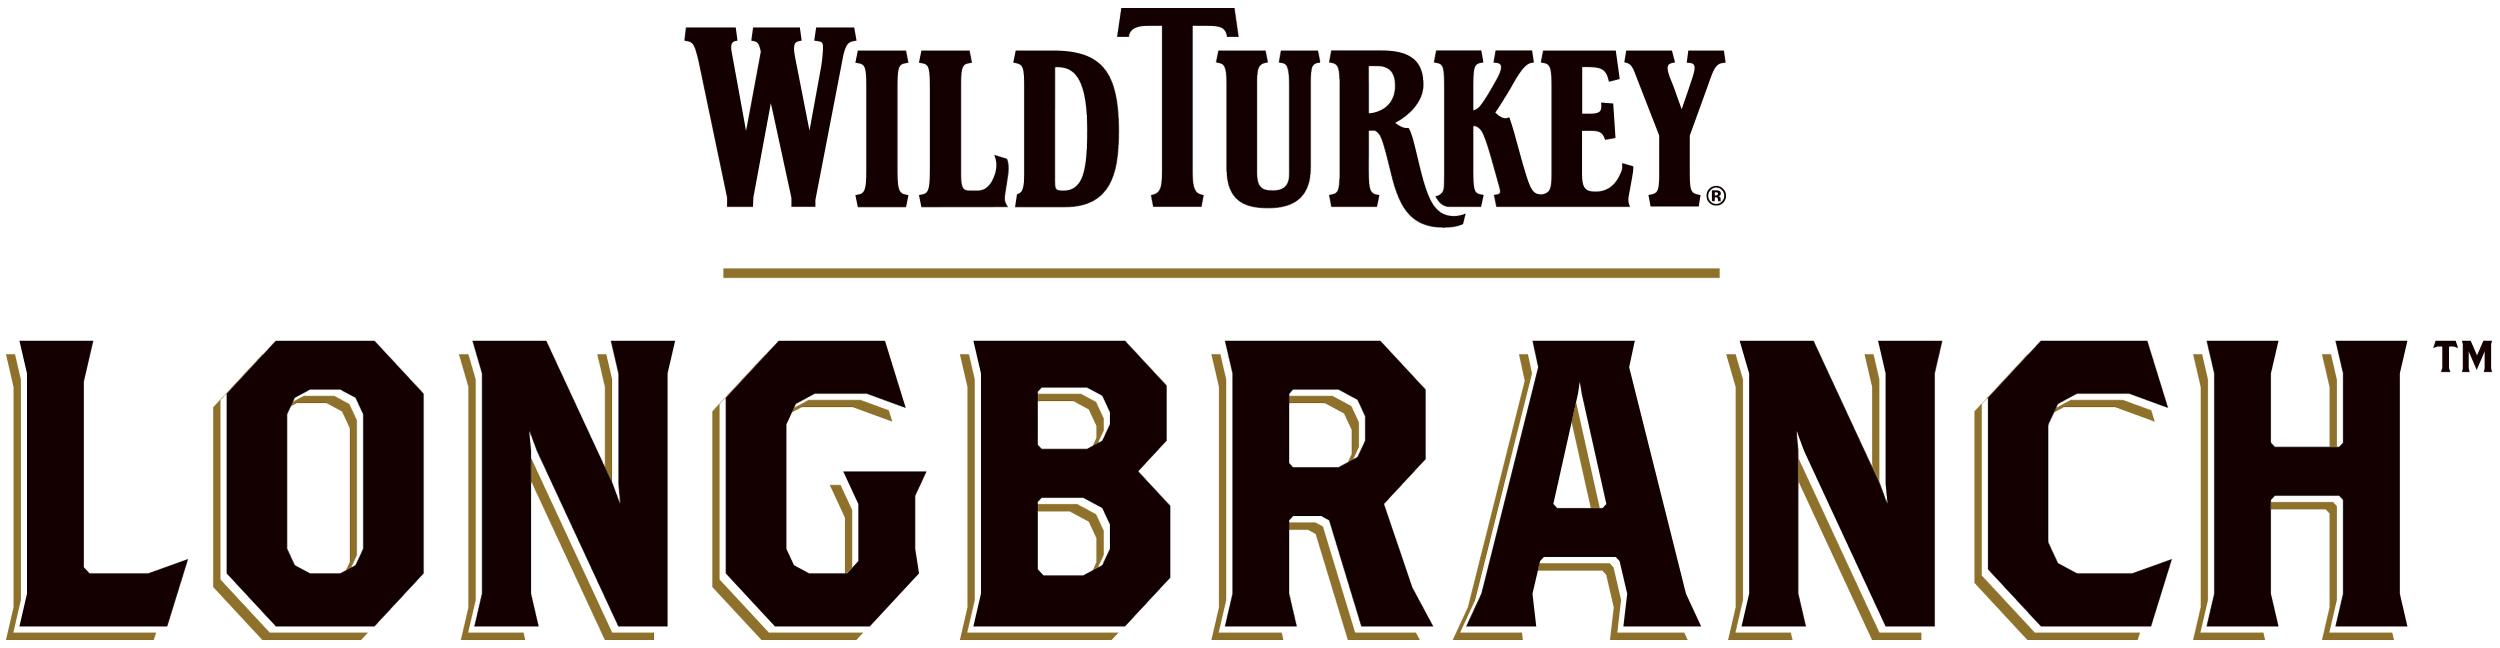 Wild-Turkey-Longbranch---Logo-with-WT - Justin Frumkes.jpg